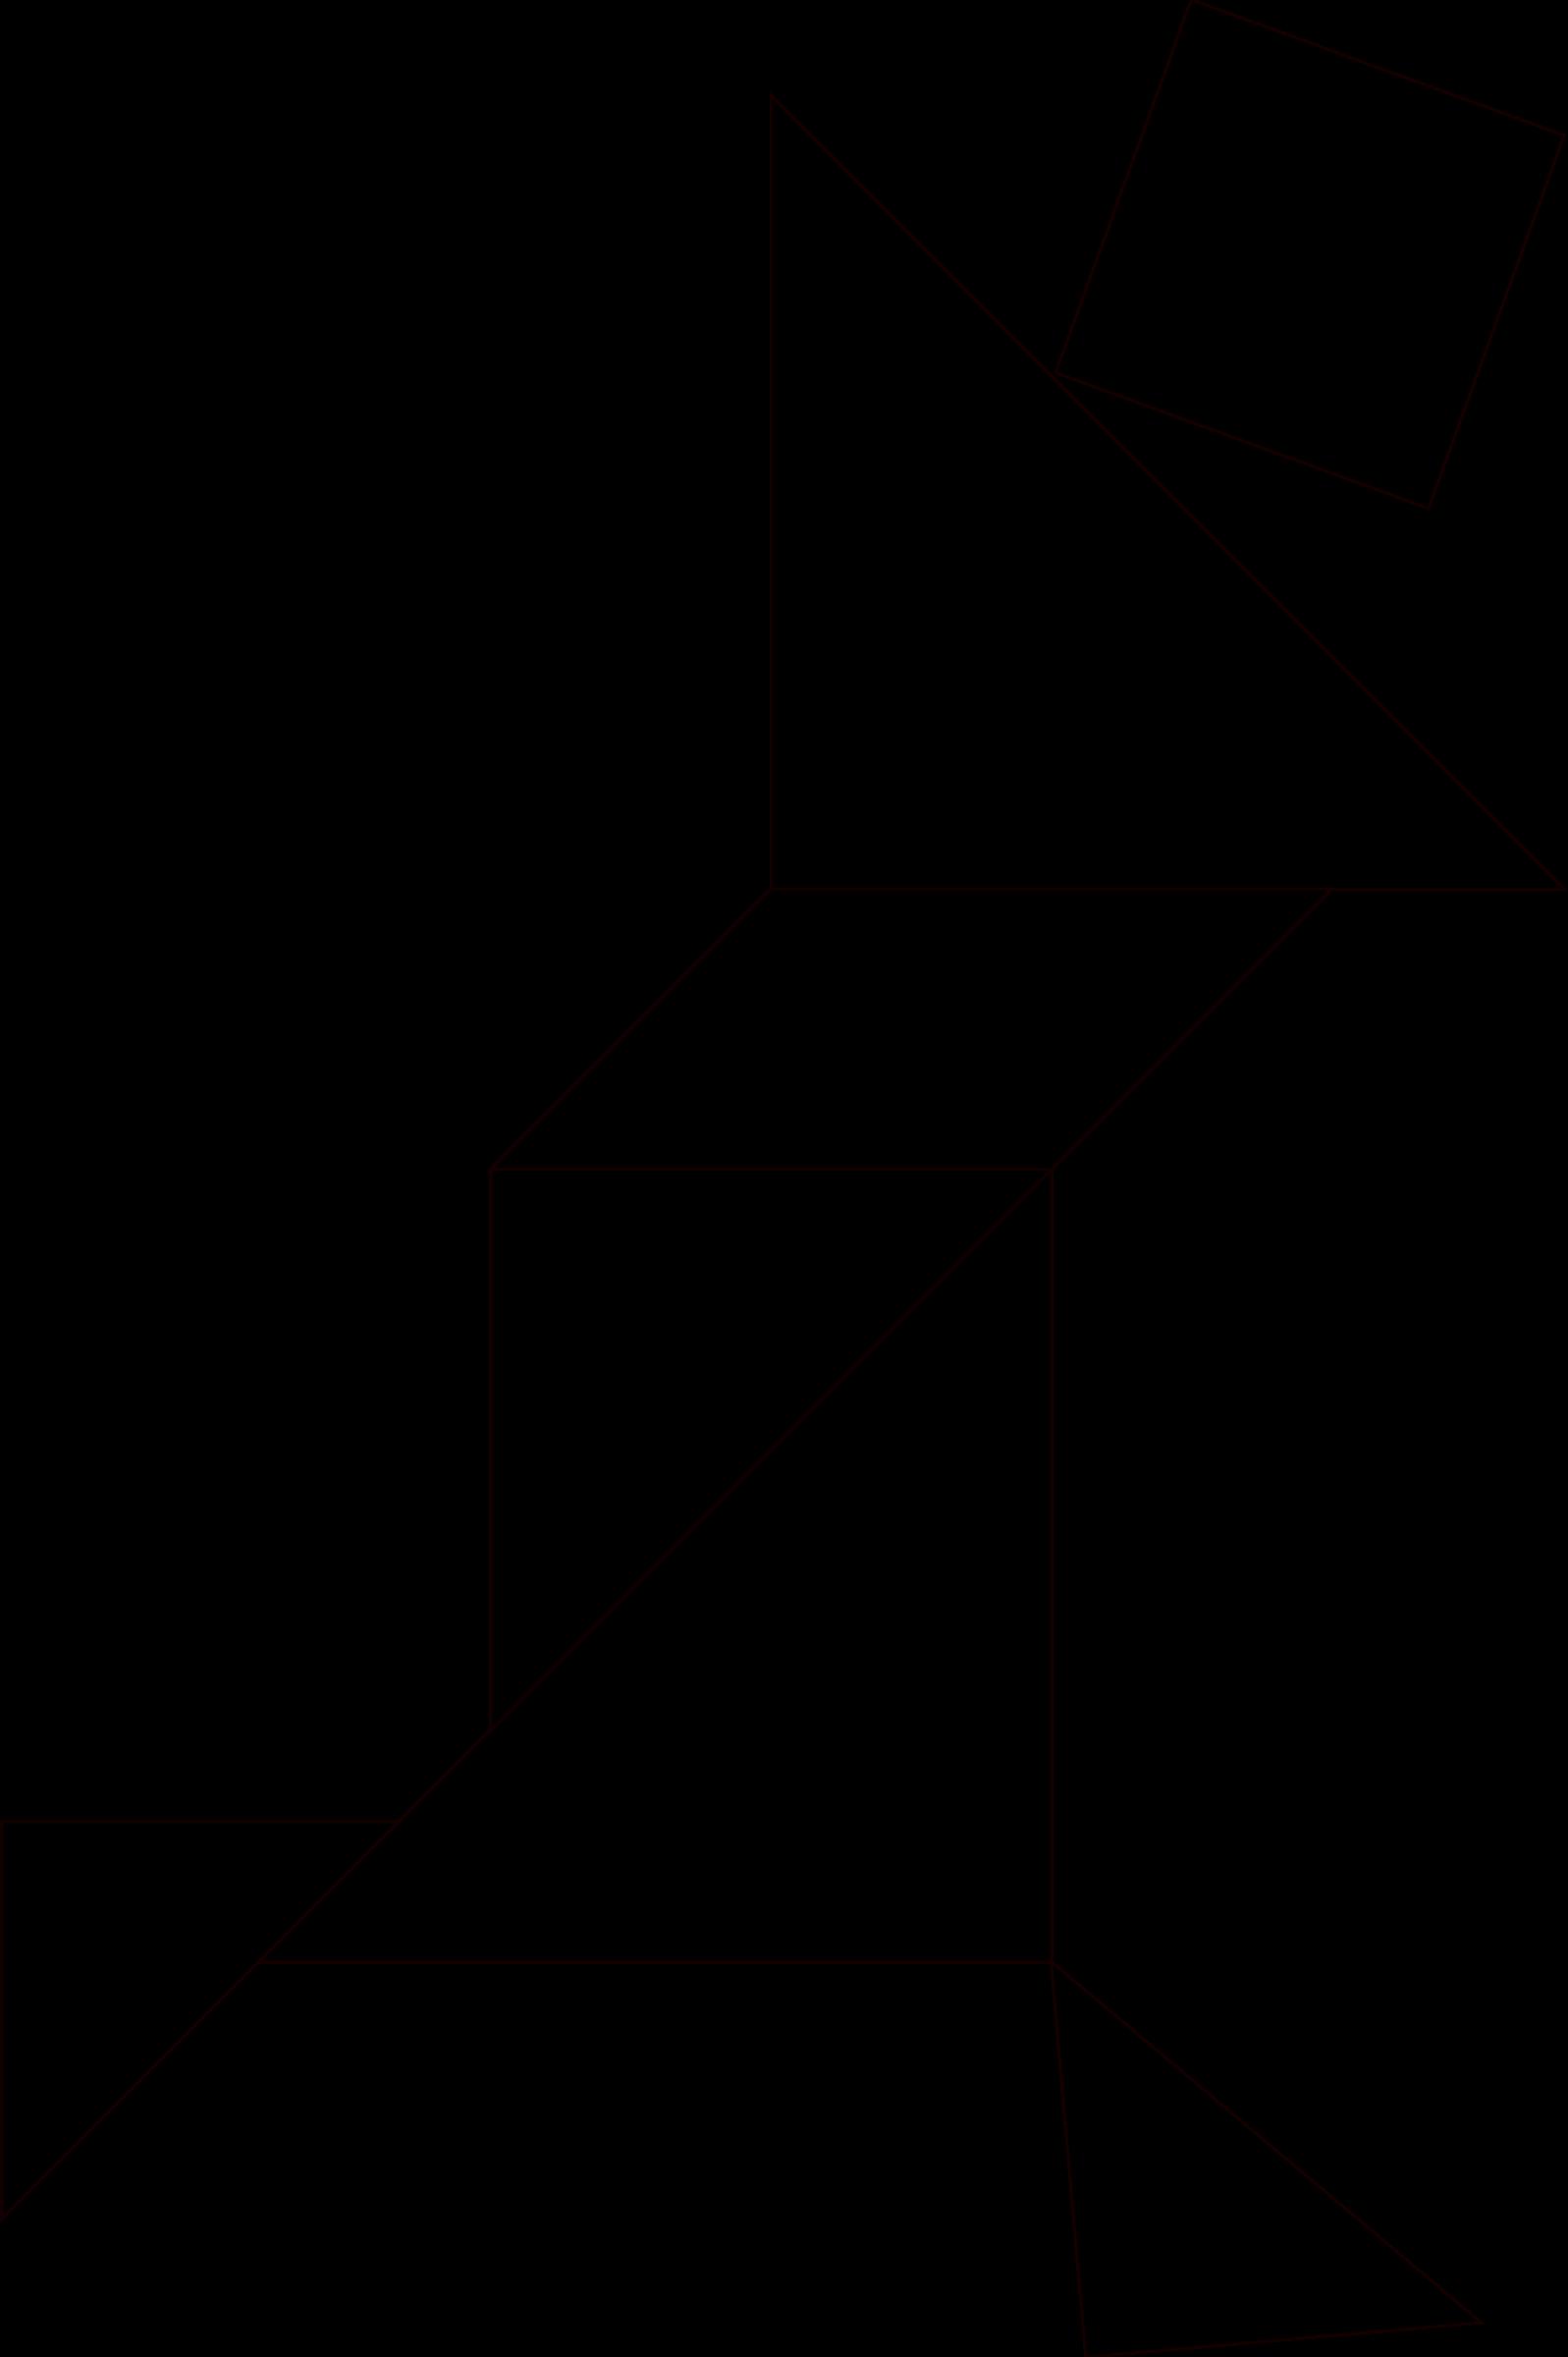 Clipart Tangram